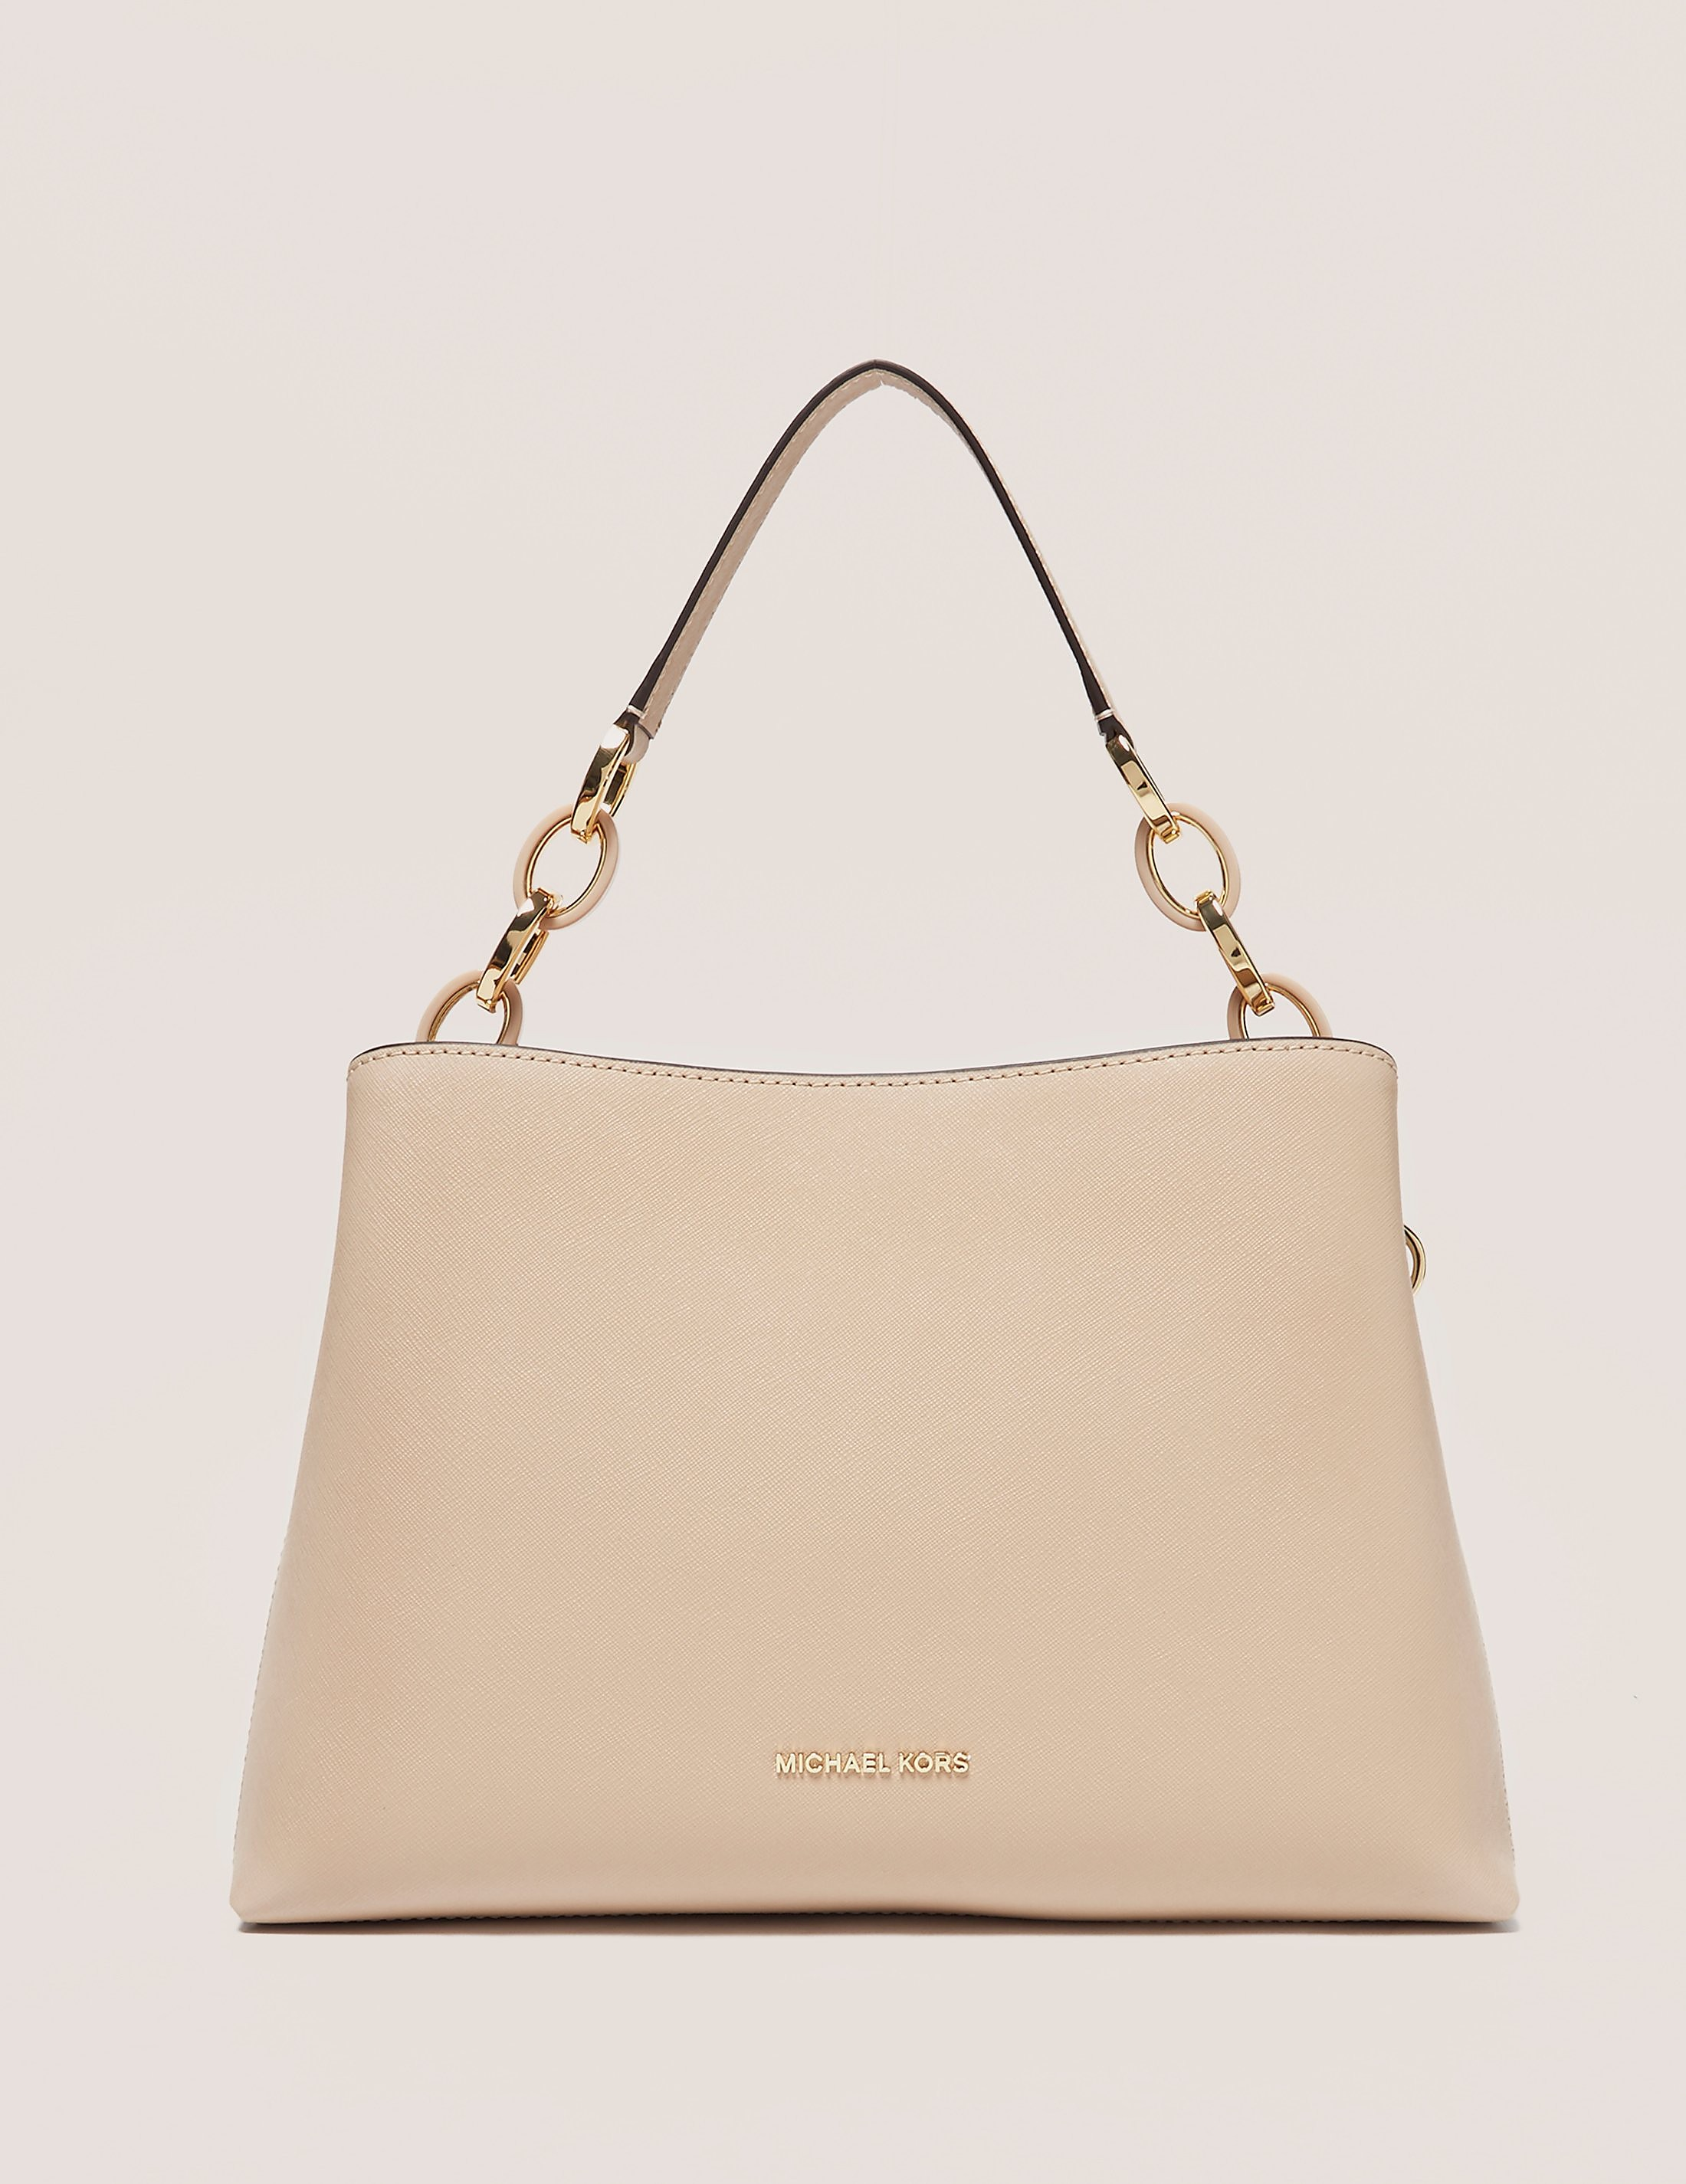 Michael Kors Portia Large Shoulder Bag